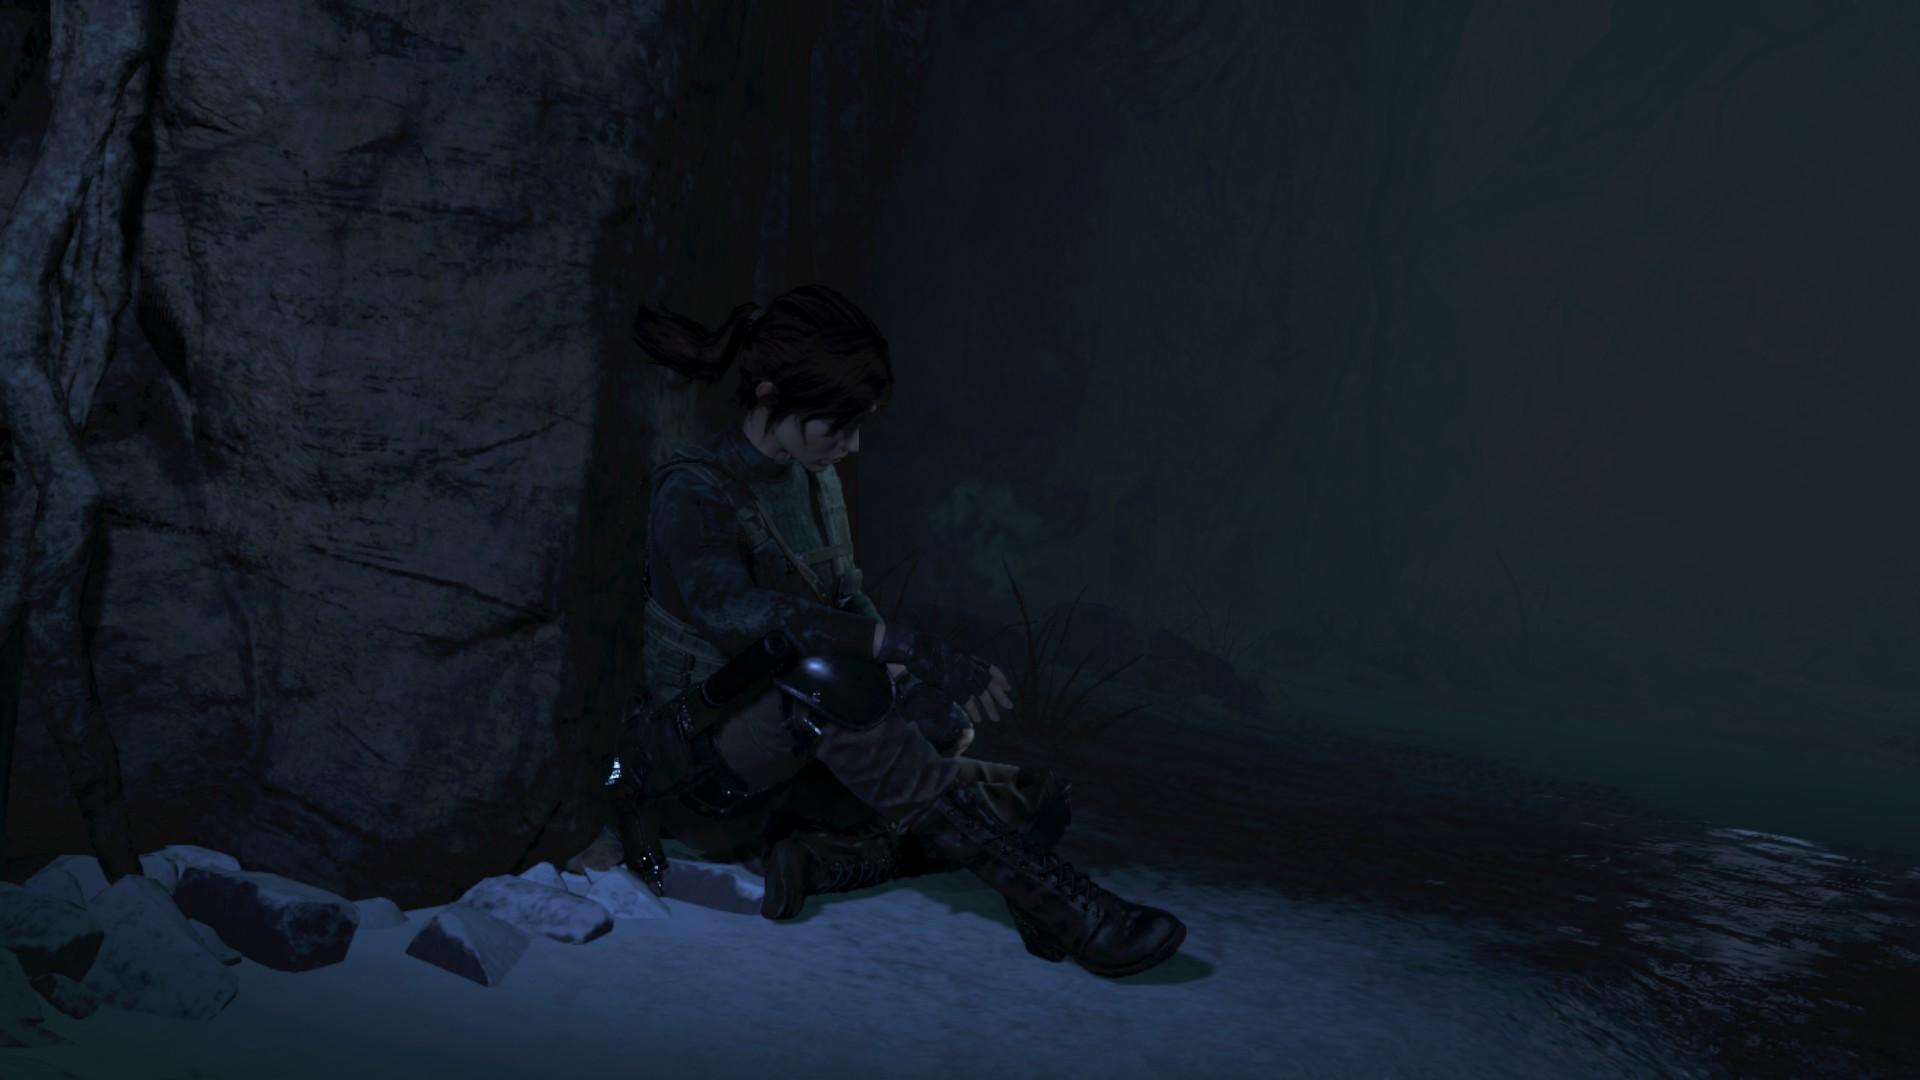 20160724153404_1.jpg - Rise of the Tomb Raider